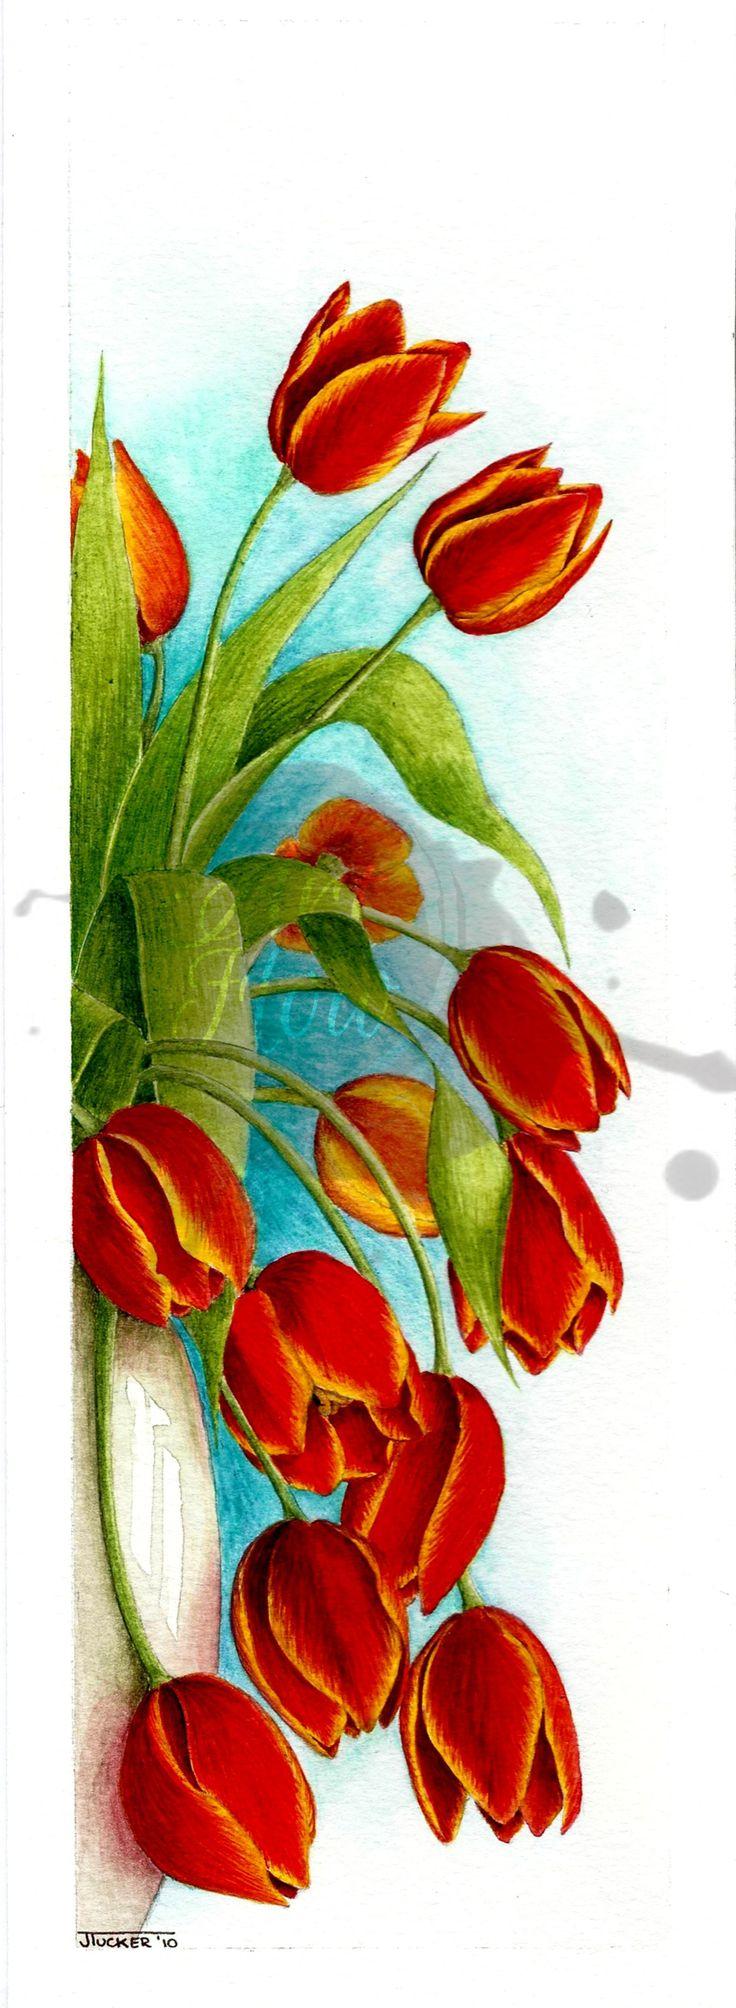 watercolour tulips in vase